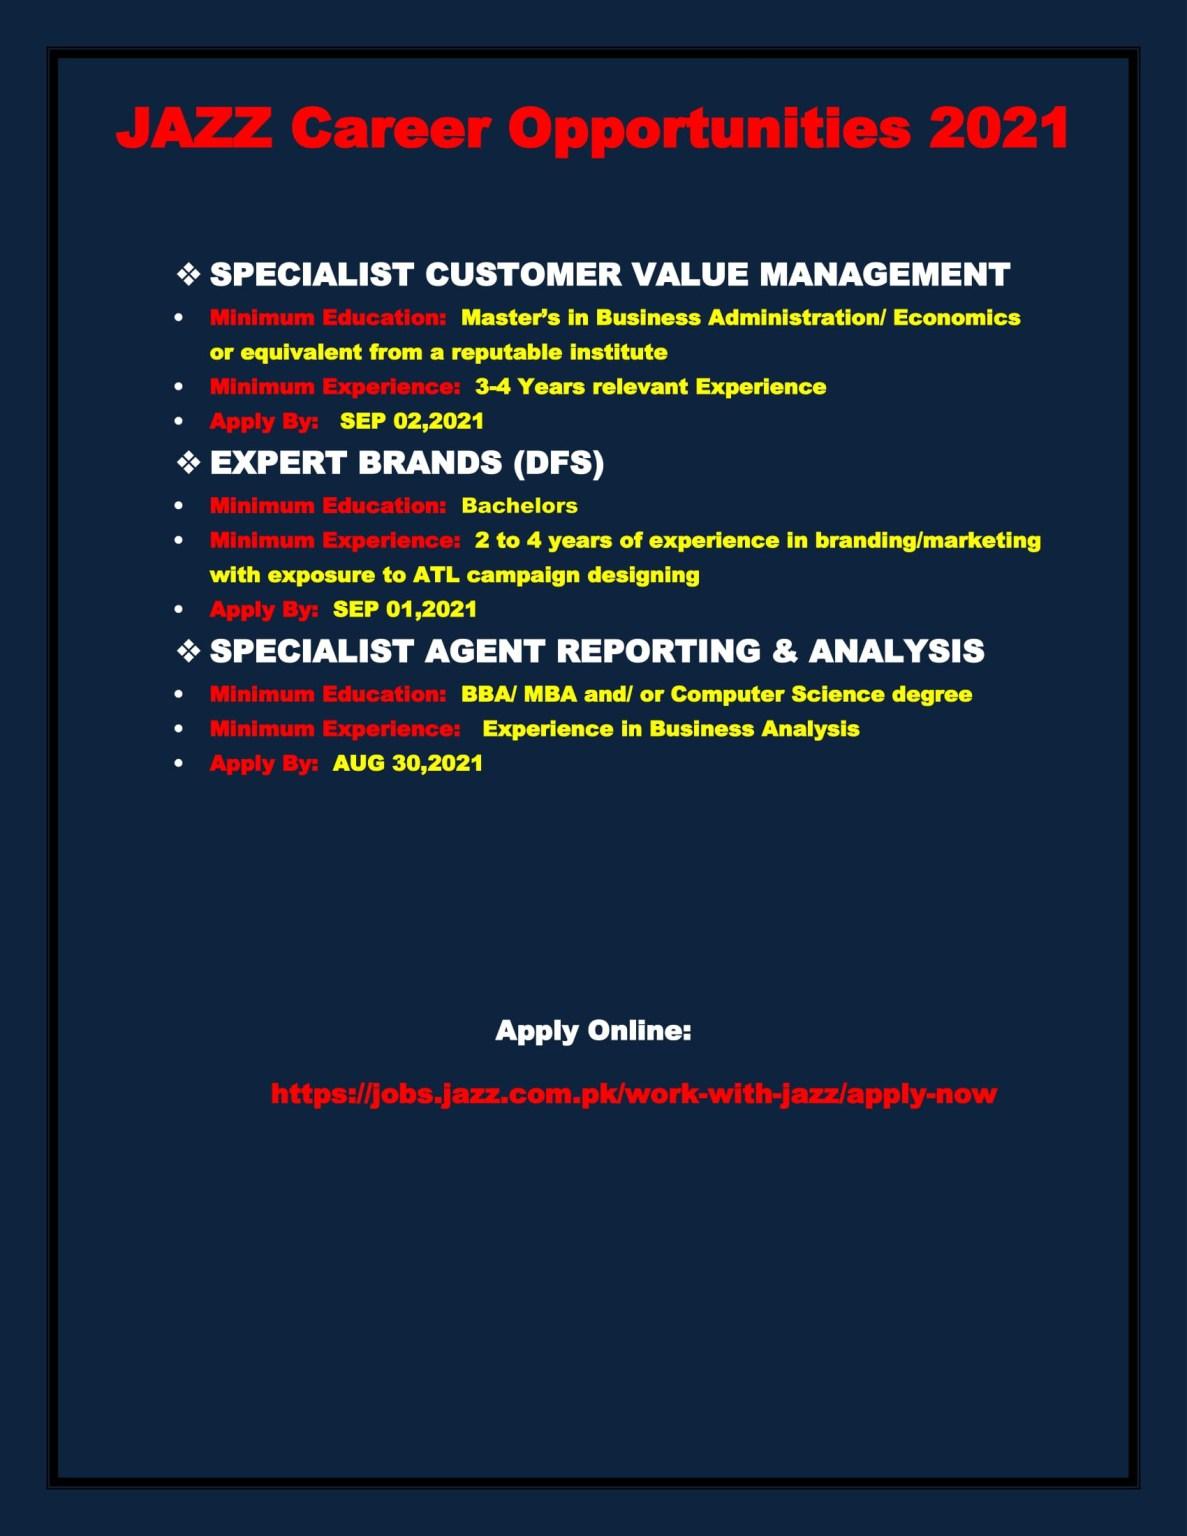 Jazz Company Jobs 2021 - Jazz Vacancies - Jazz Jobs 2021 - Jazz Call Center Jobs 2021 - Jazz Call Center Jobs in Lahore